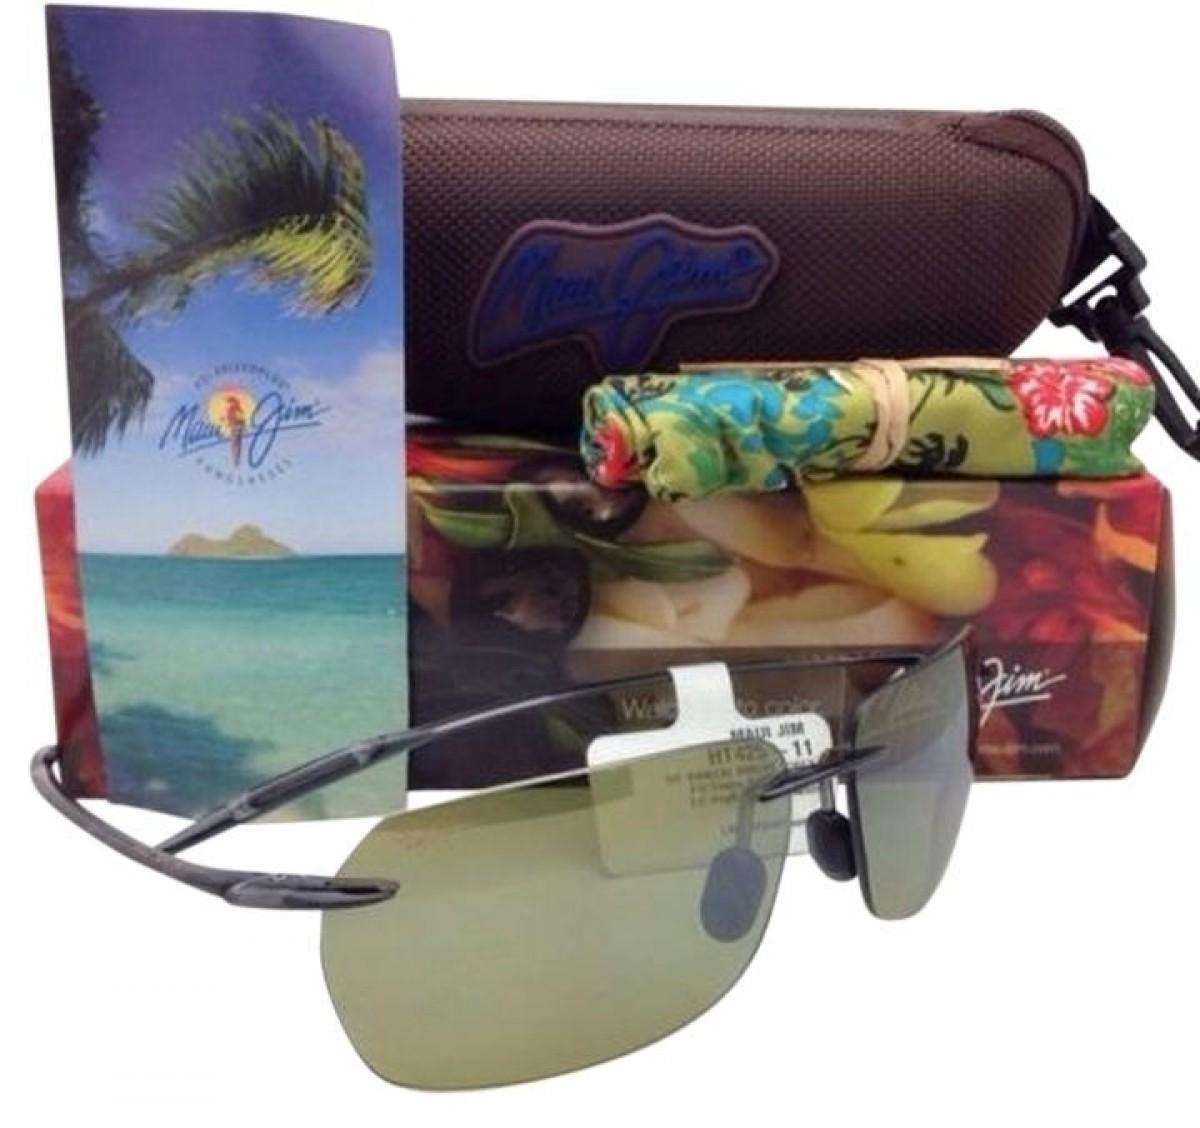 Maui Jim Banzai HT407-11, 147,00€, Occhiali Maui Jim Verde a forma Rettangolare